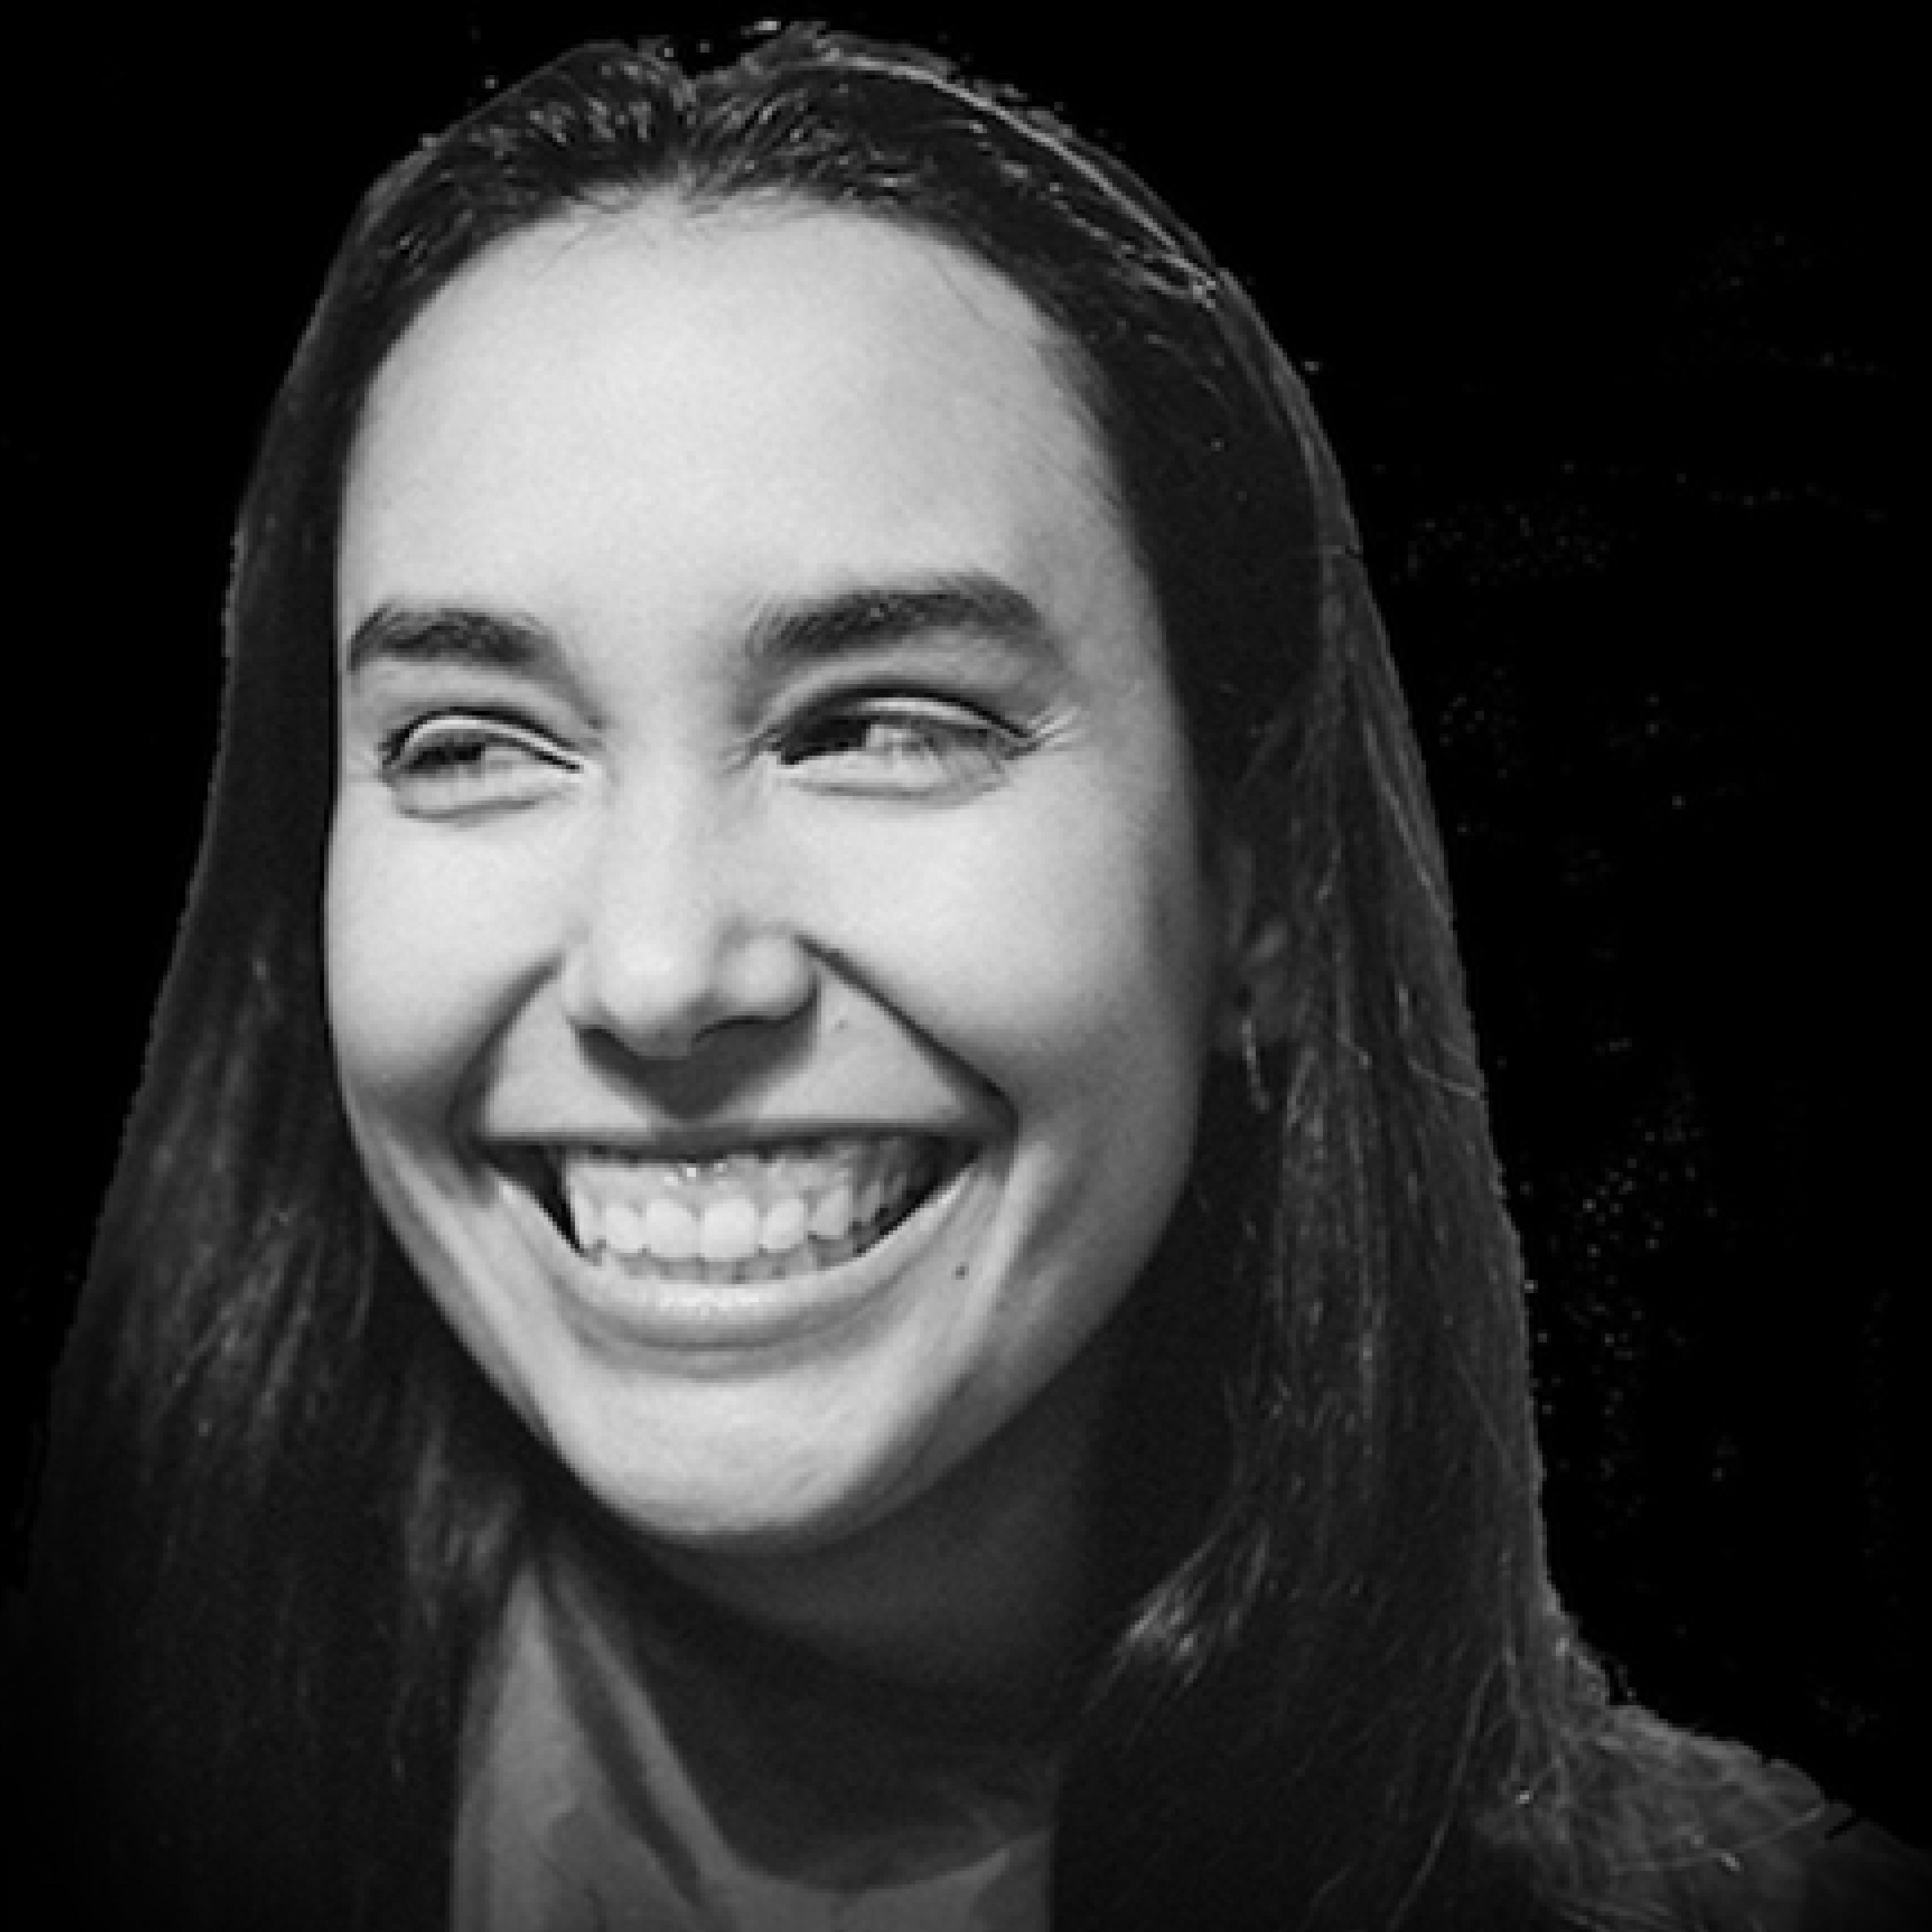 A black and white headshot photo of a women